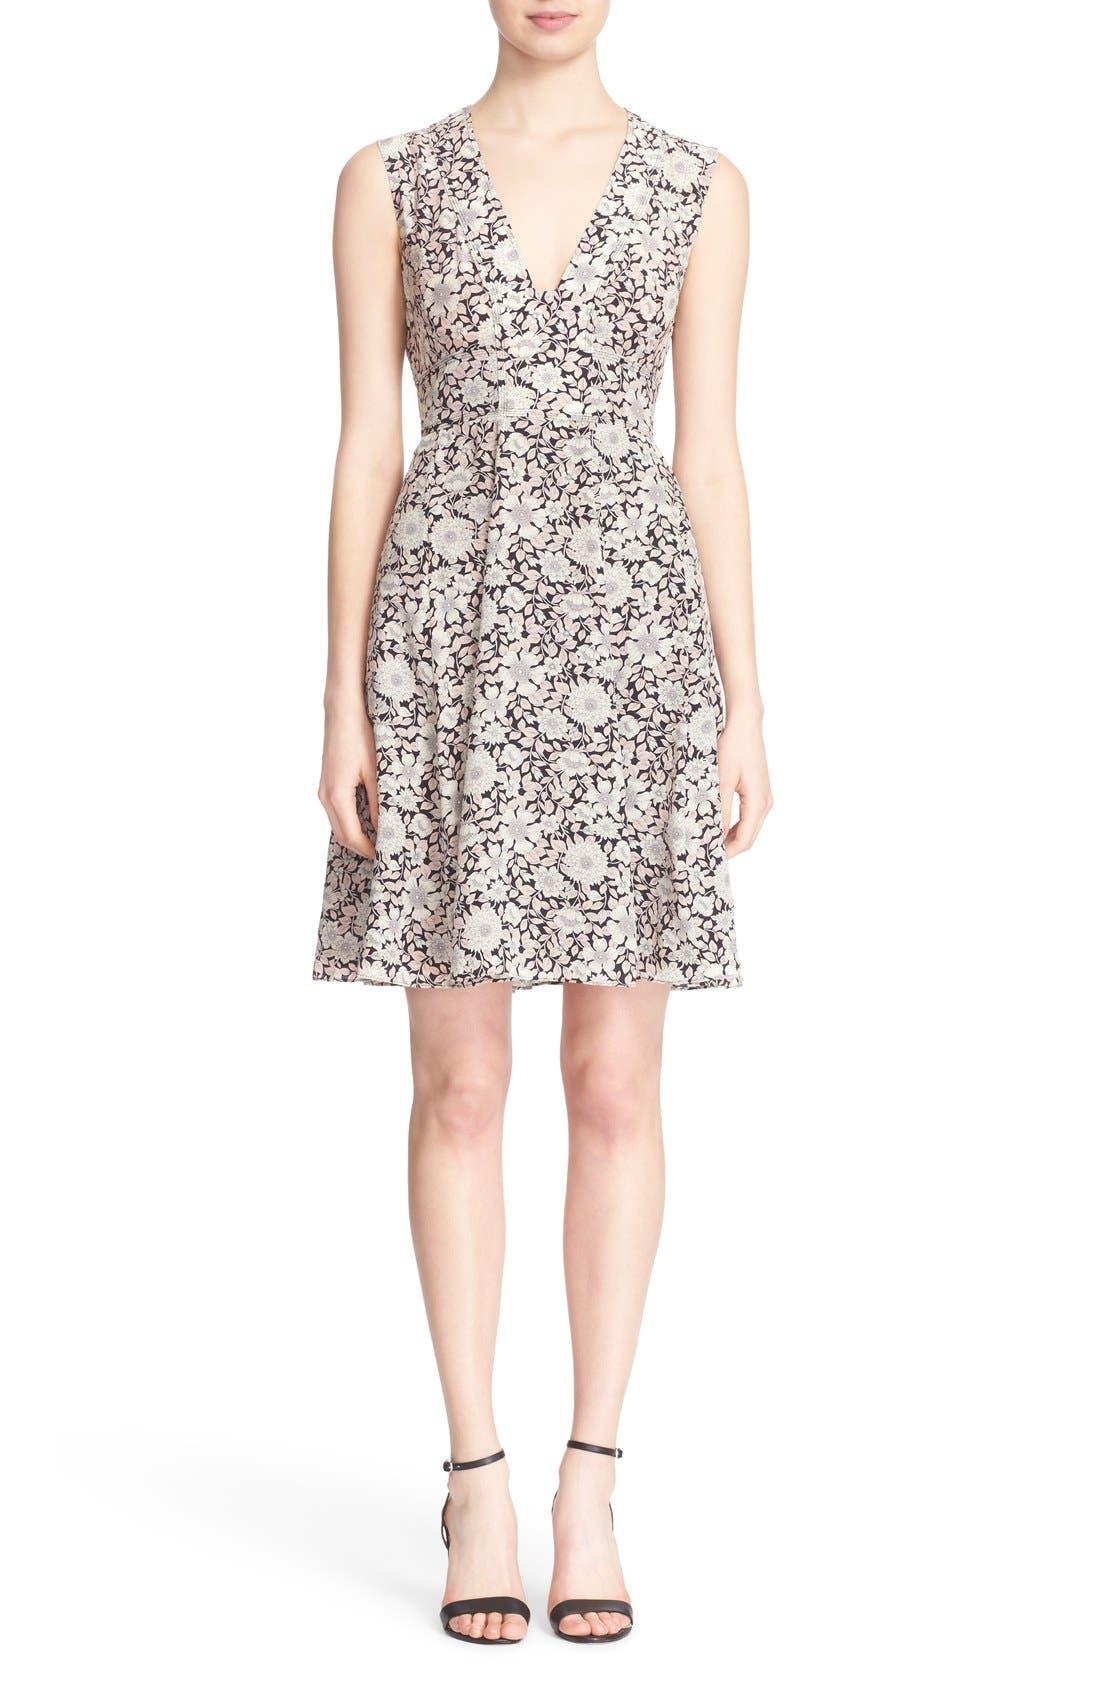 Alternate Image 1 Selected - Rebecca Taylor 'Lindsay' Floral Print Sleeveless Silk Fit & Flare Dress